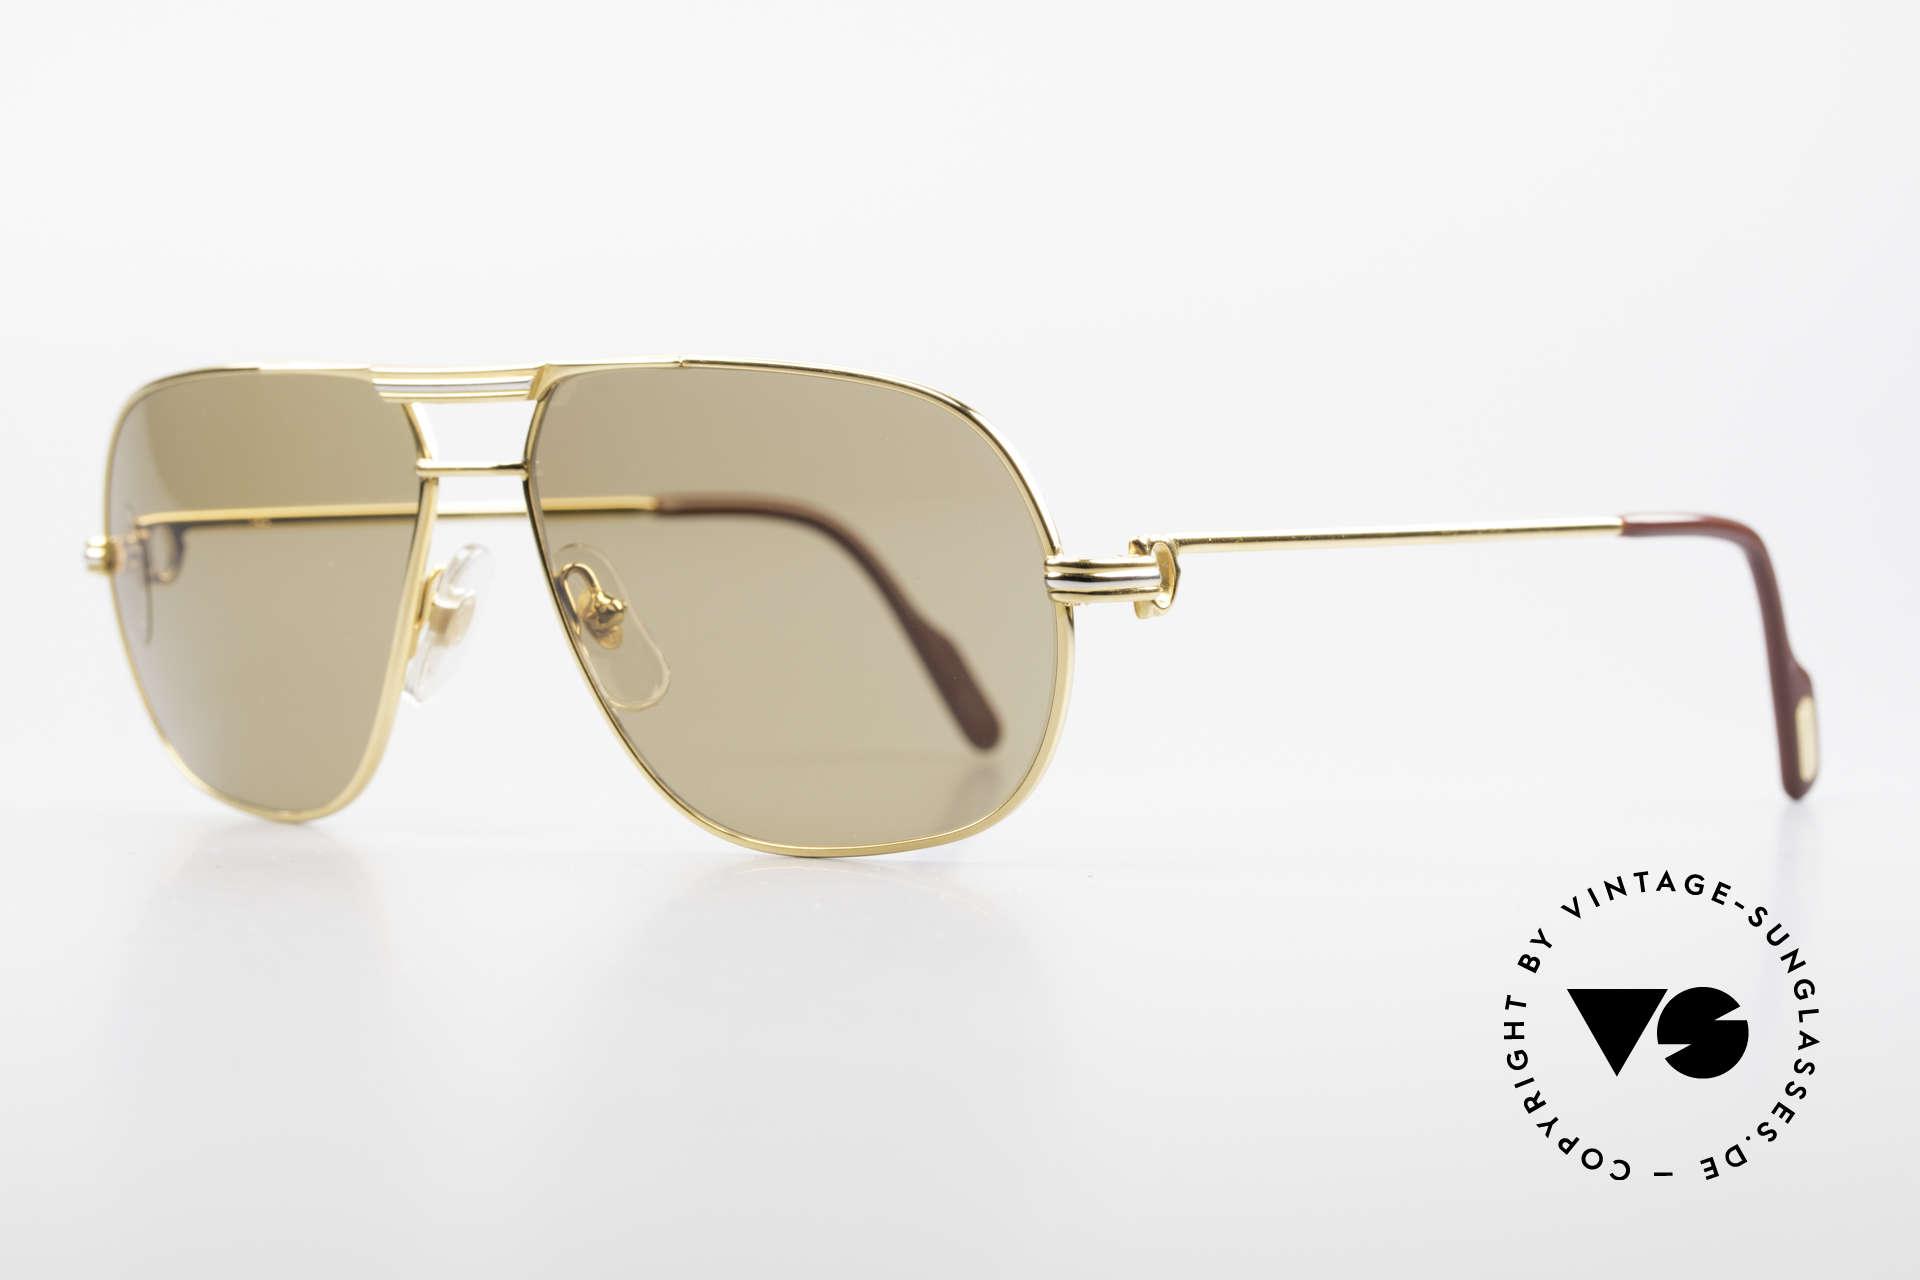 Cartier Tank - M Mystic Cartier Sun Lenses, 22ct gold-plated frame (like all vintage Cartier originals), Made for Men